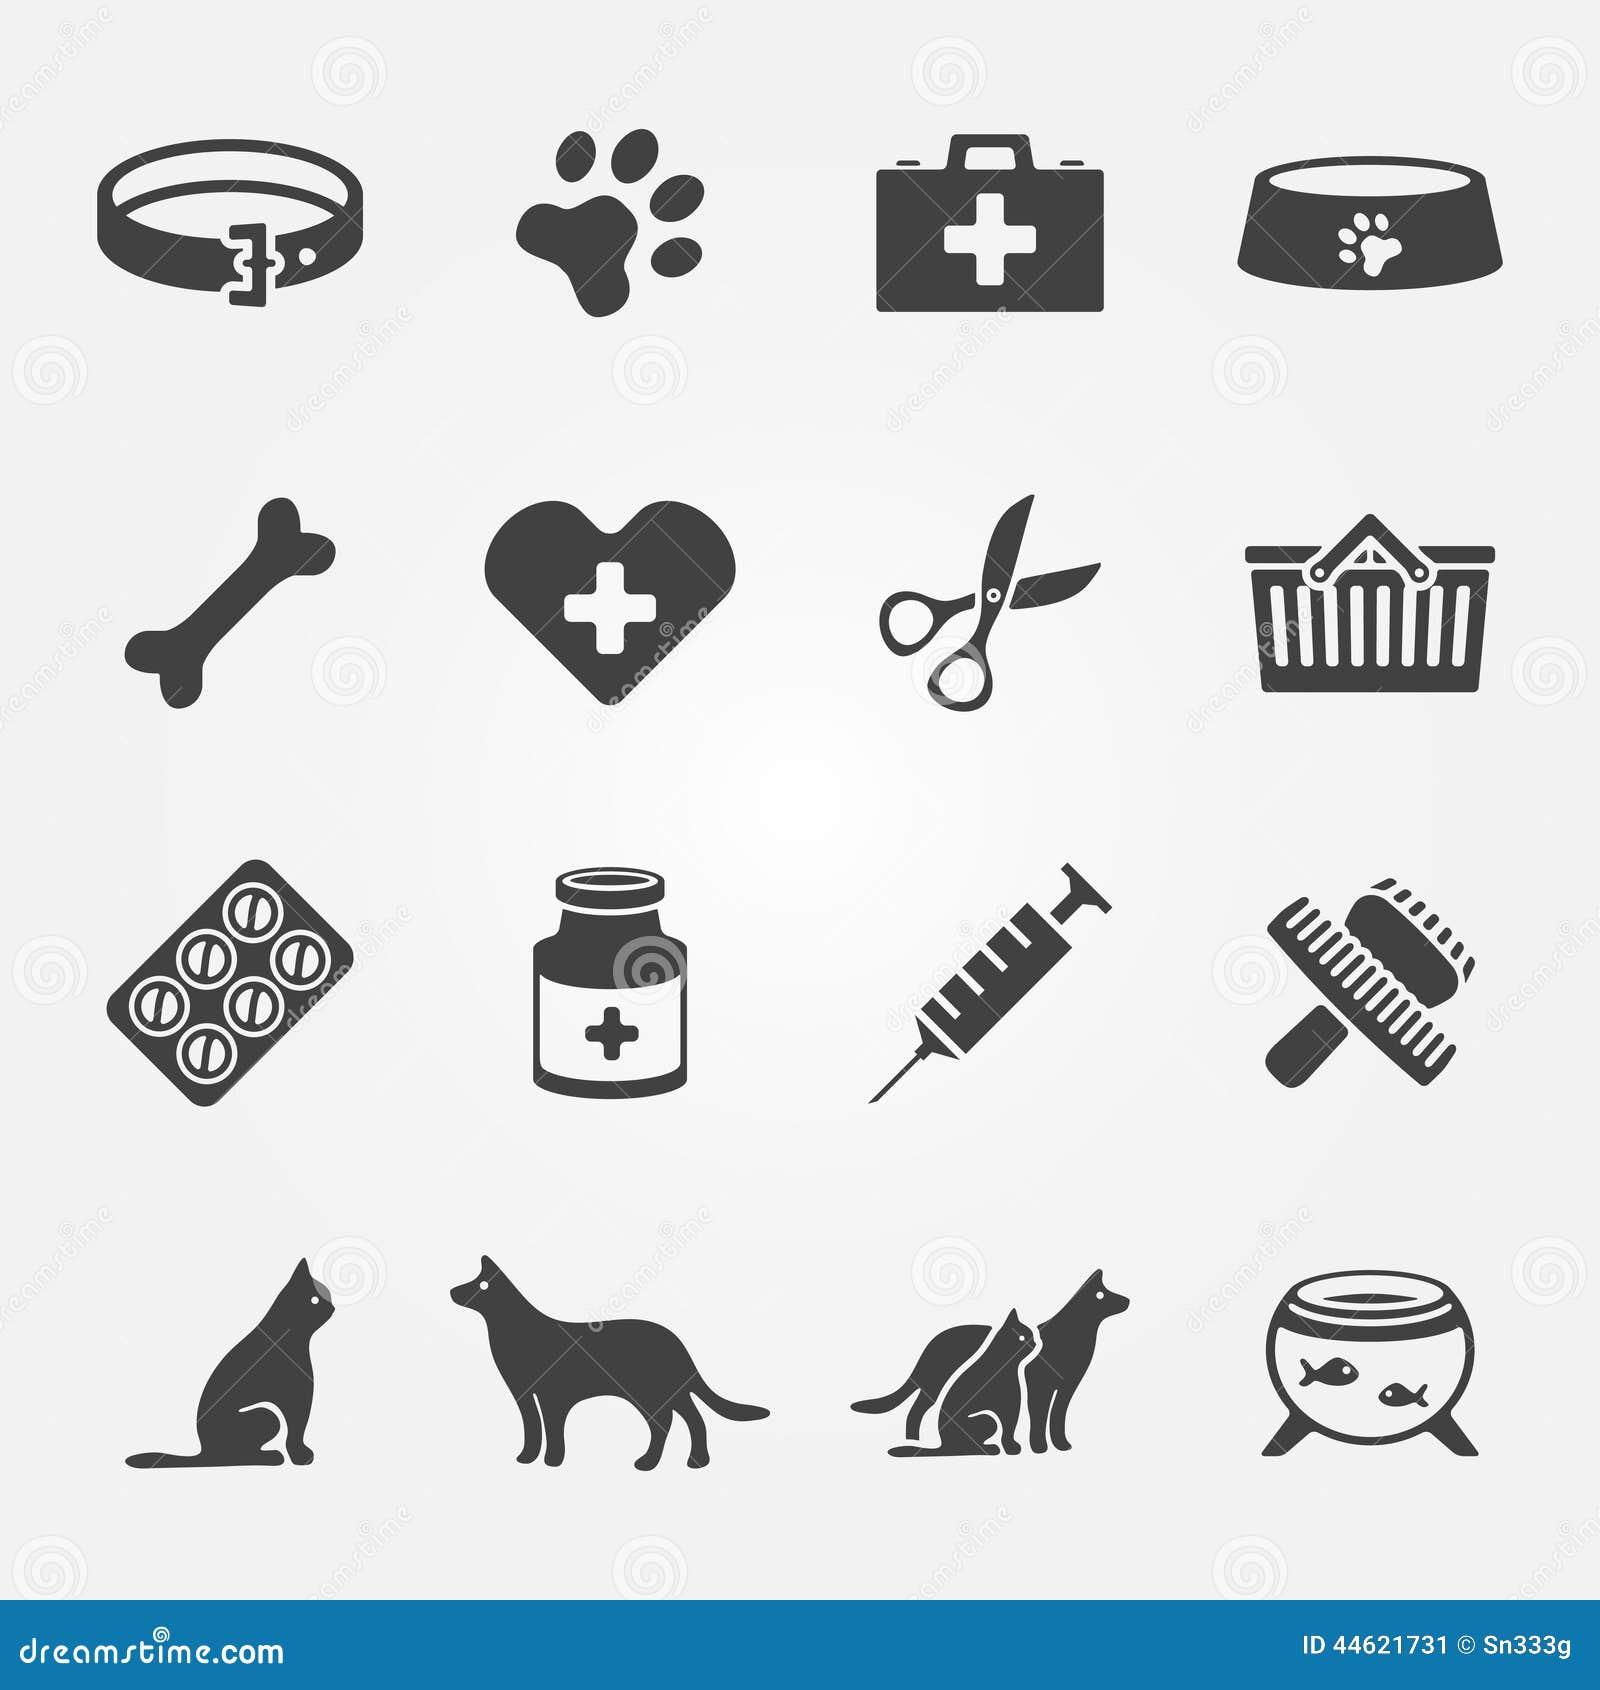 Veterinary Hospital Web Design